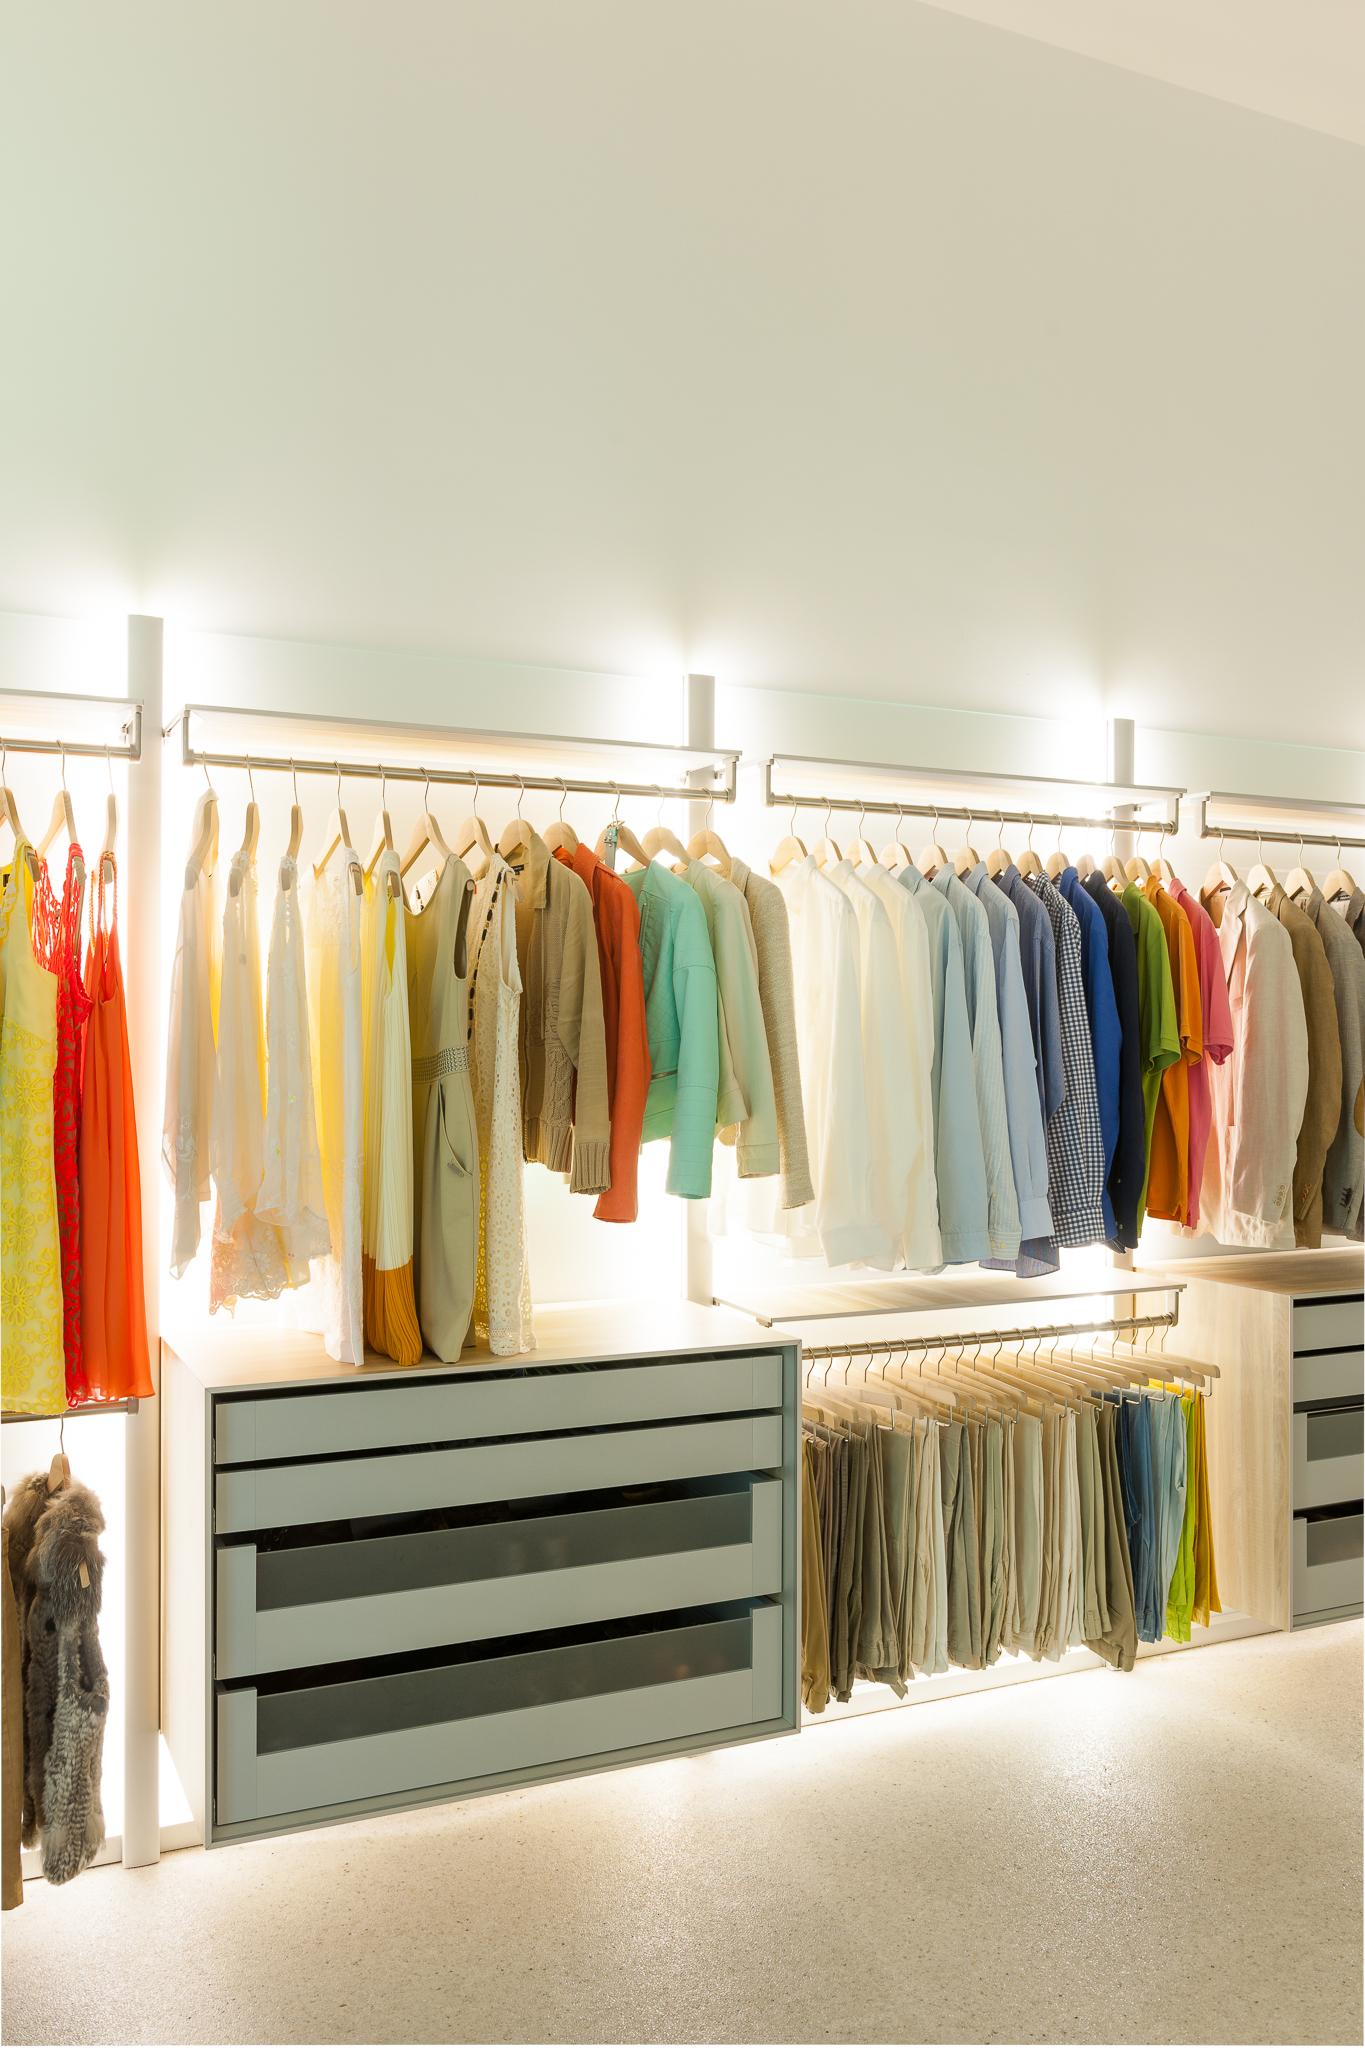 dressing verlichting met led dress a way inloopkasten op maat. Black Bedroom Furniture Sets. Home Design Ideas